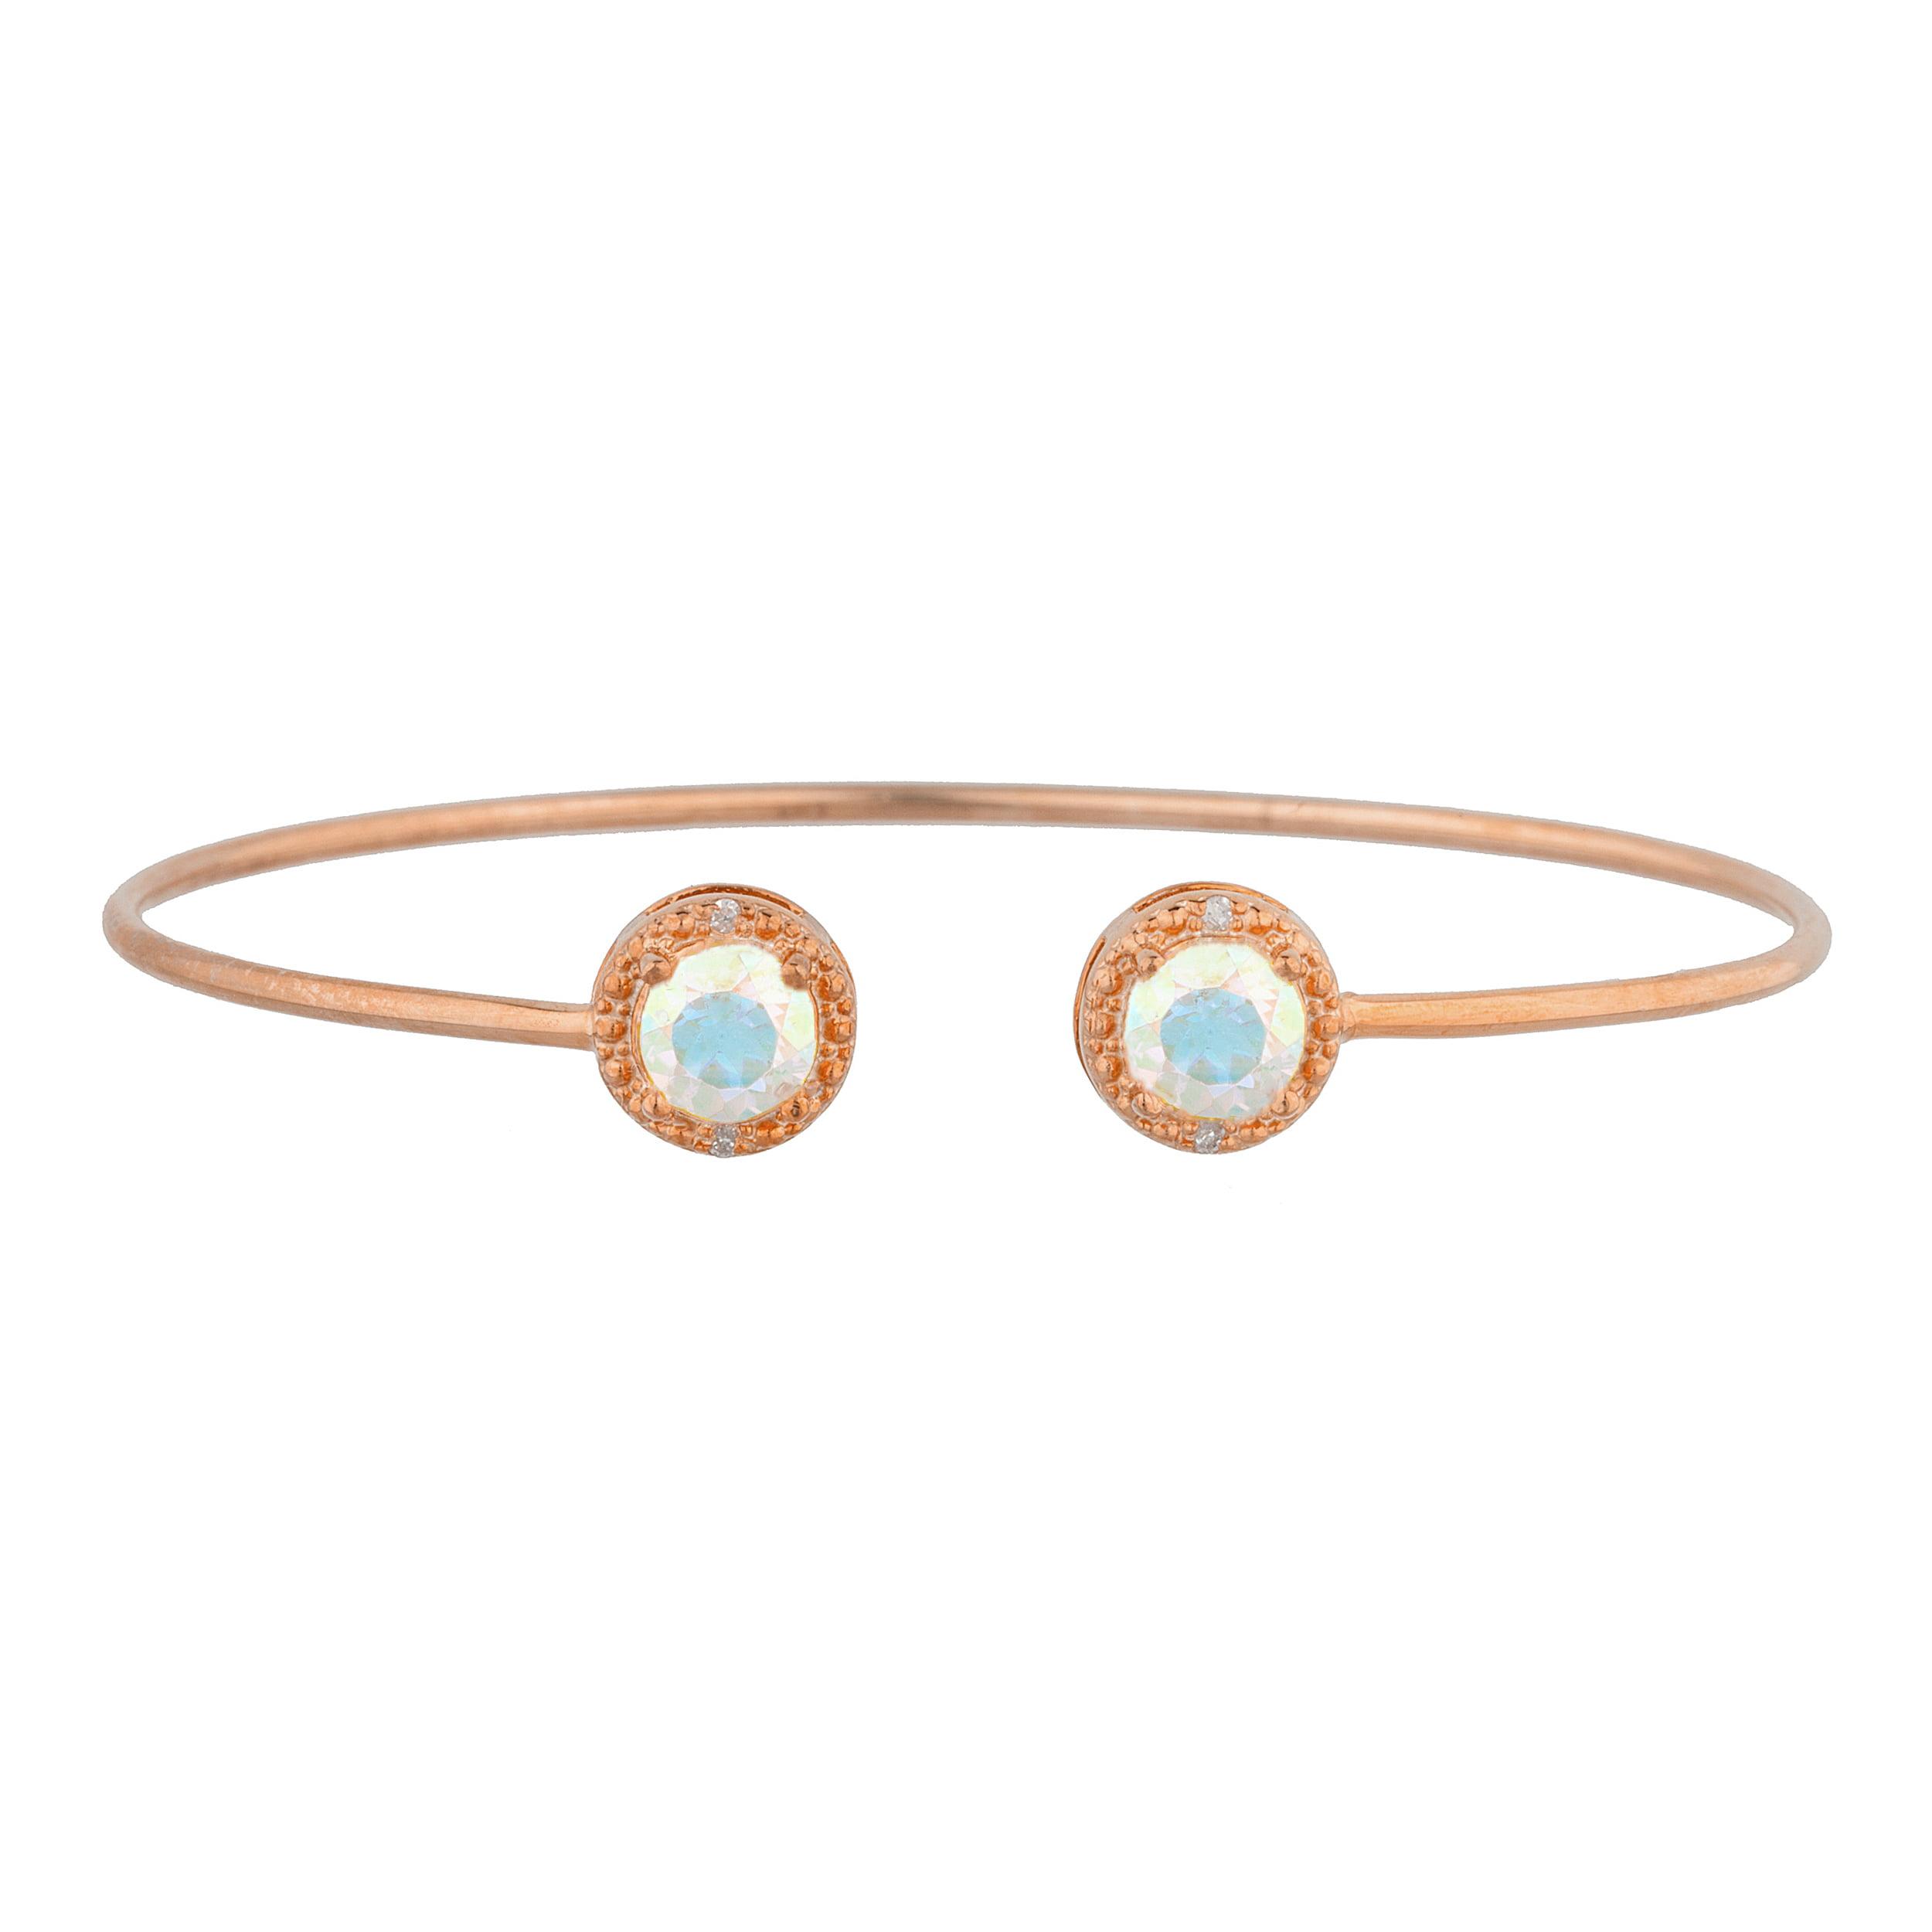 14Kt Rose Gold Plated Natural Mercury Mist Mystic Topaz & Diamond Round Bangle Bracelet by Elizabeth Jewelry Inc